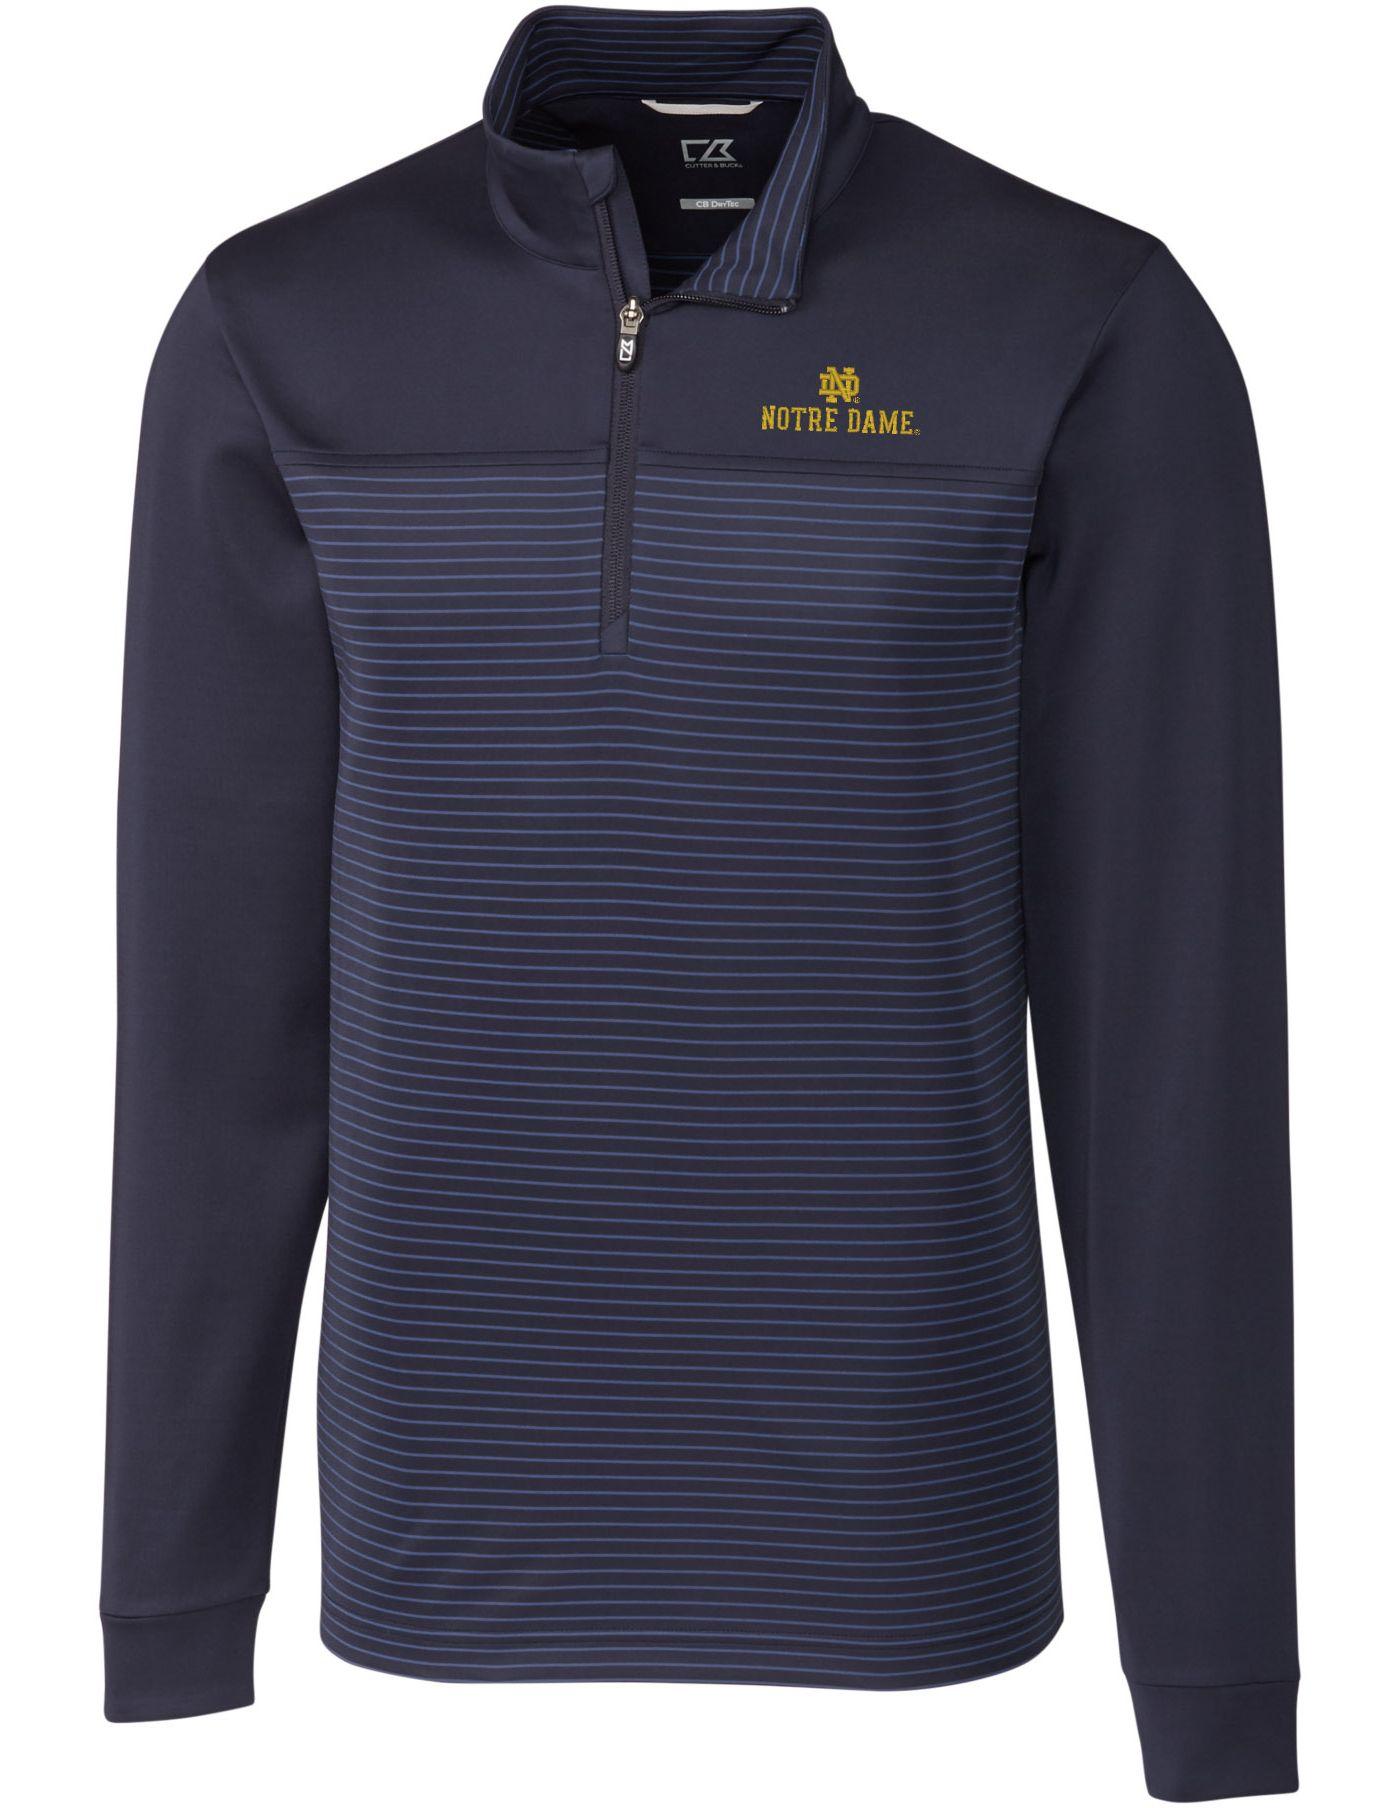 Cutter & Buck Men's Notre Dame Fighting Irish Navy Traverse Stripe Half-Zip Shirt